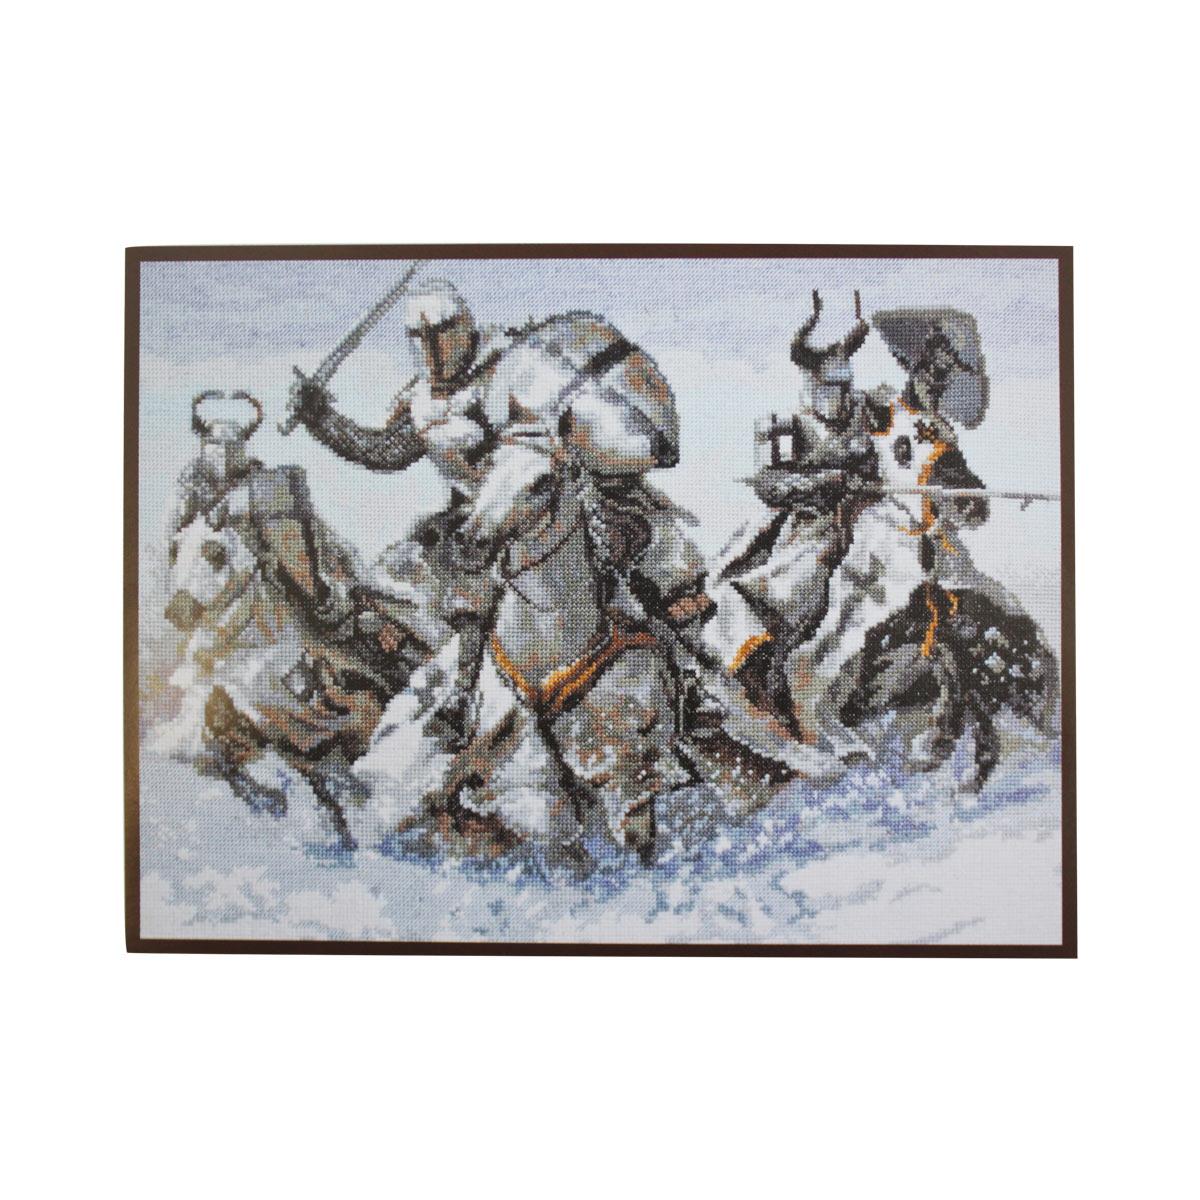 07.008 Набор для вышивания 'Палитра' 'Рыцари', 36*26 см